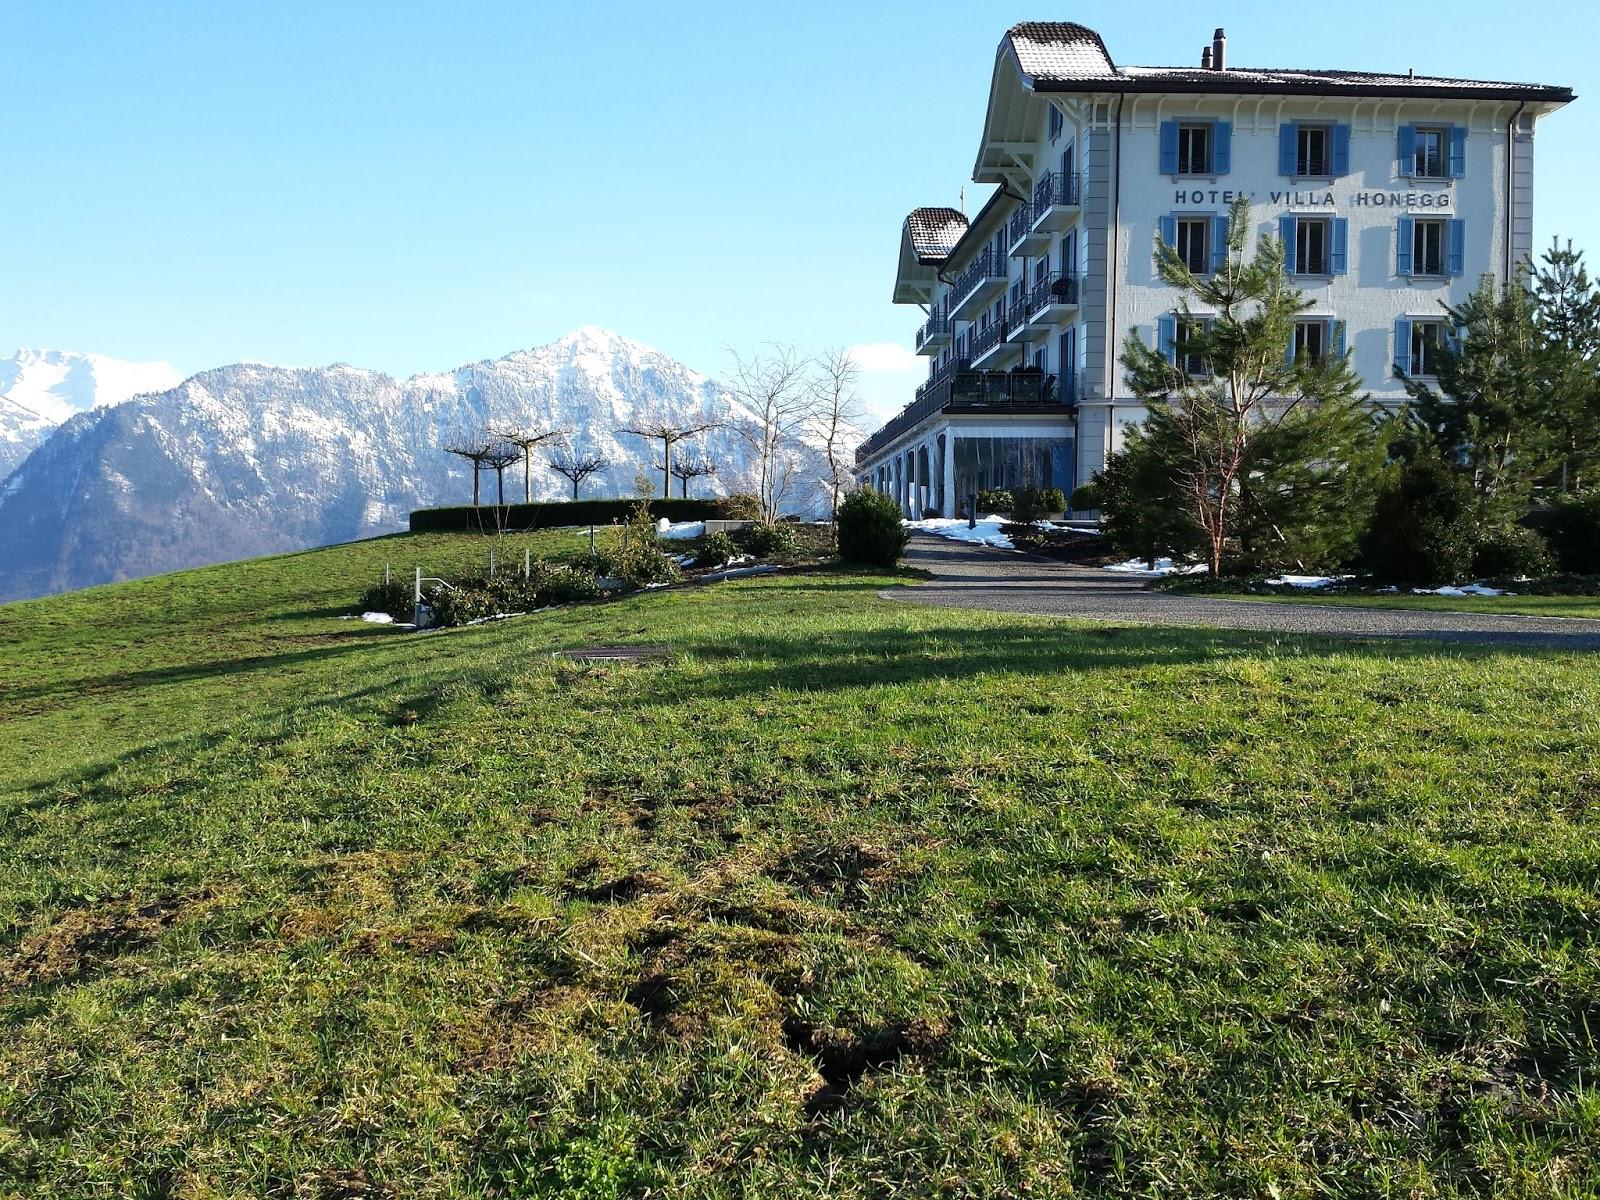 Hotel Villa Honegg tout menu viagem: hotel villa honegg: o melhor da suíça